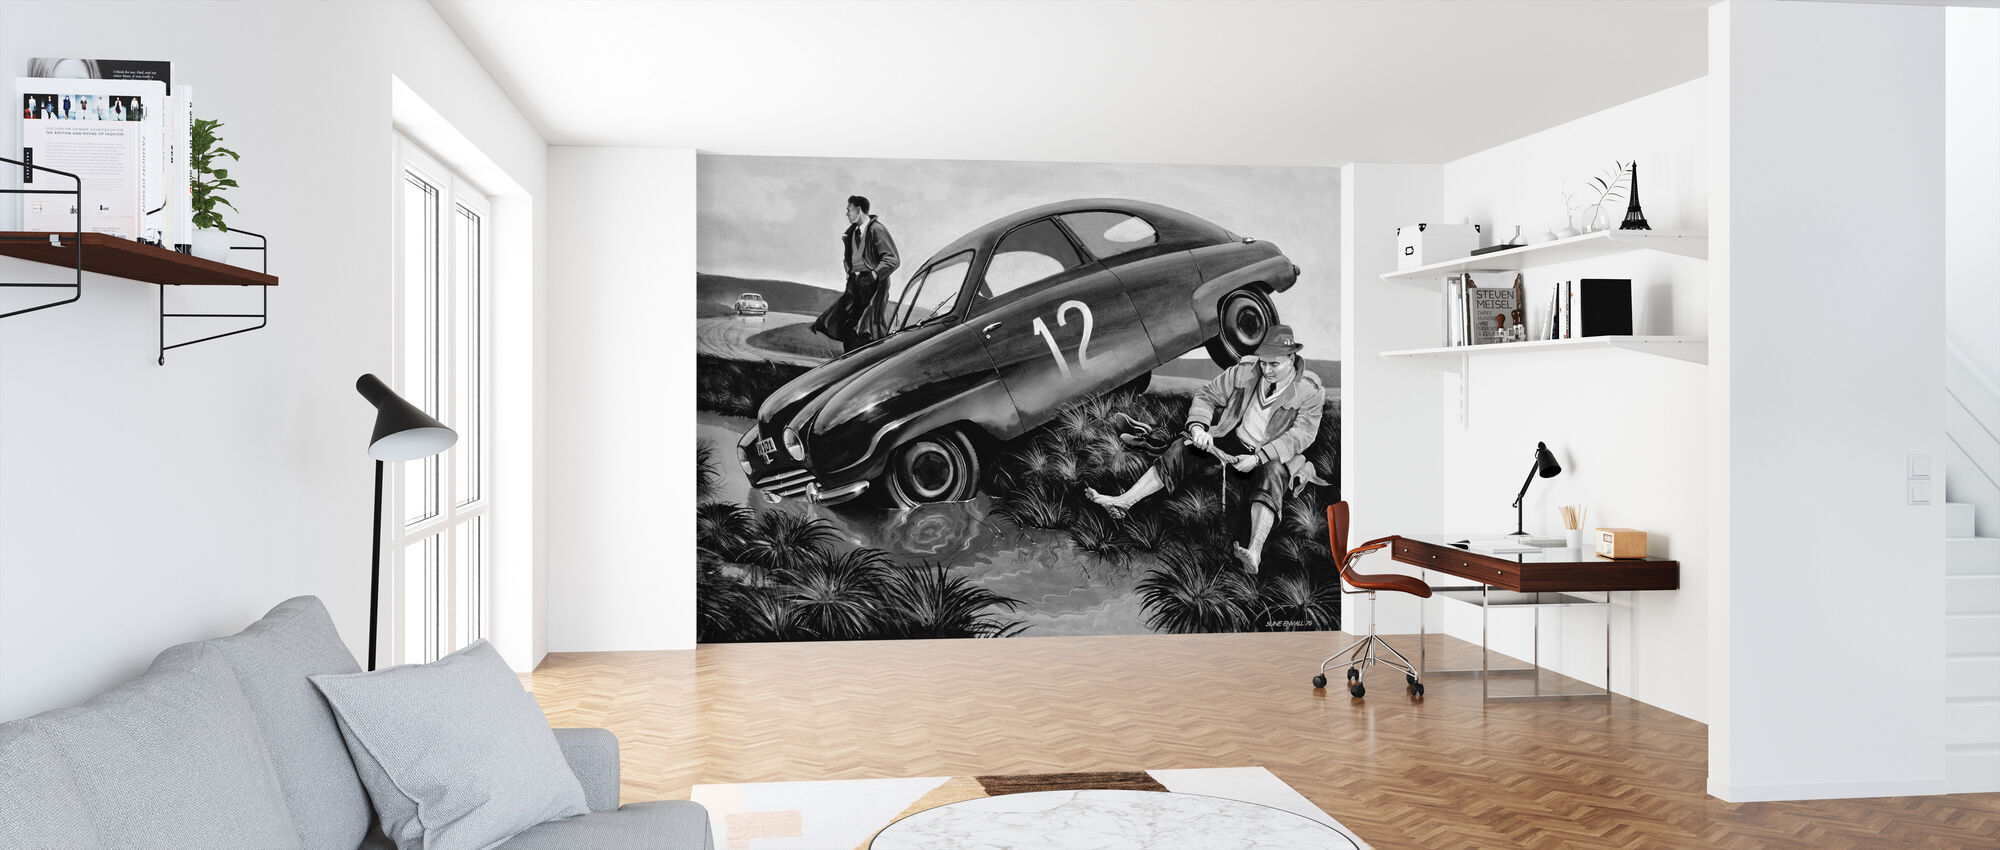 Carlsson Car BW - Wallpaper - Office